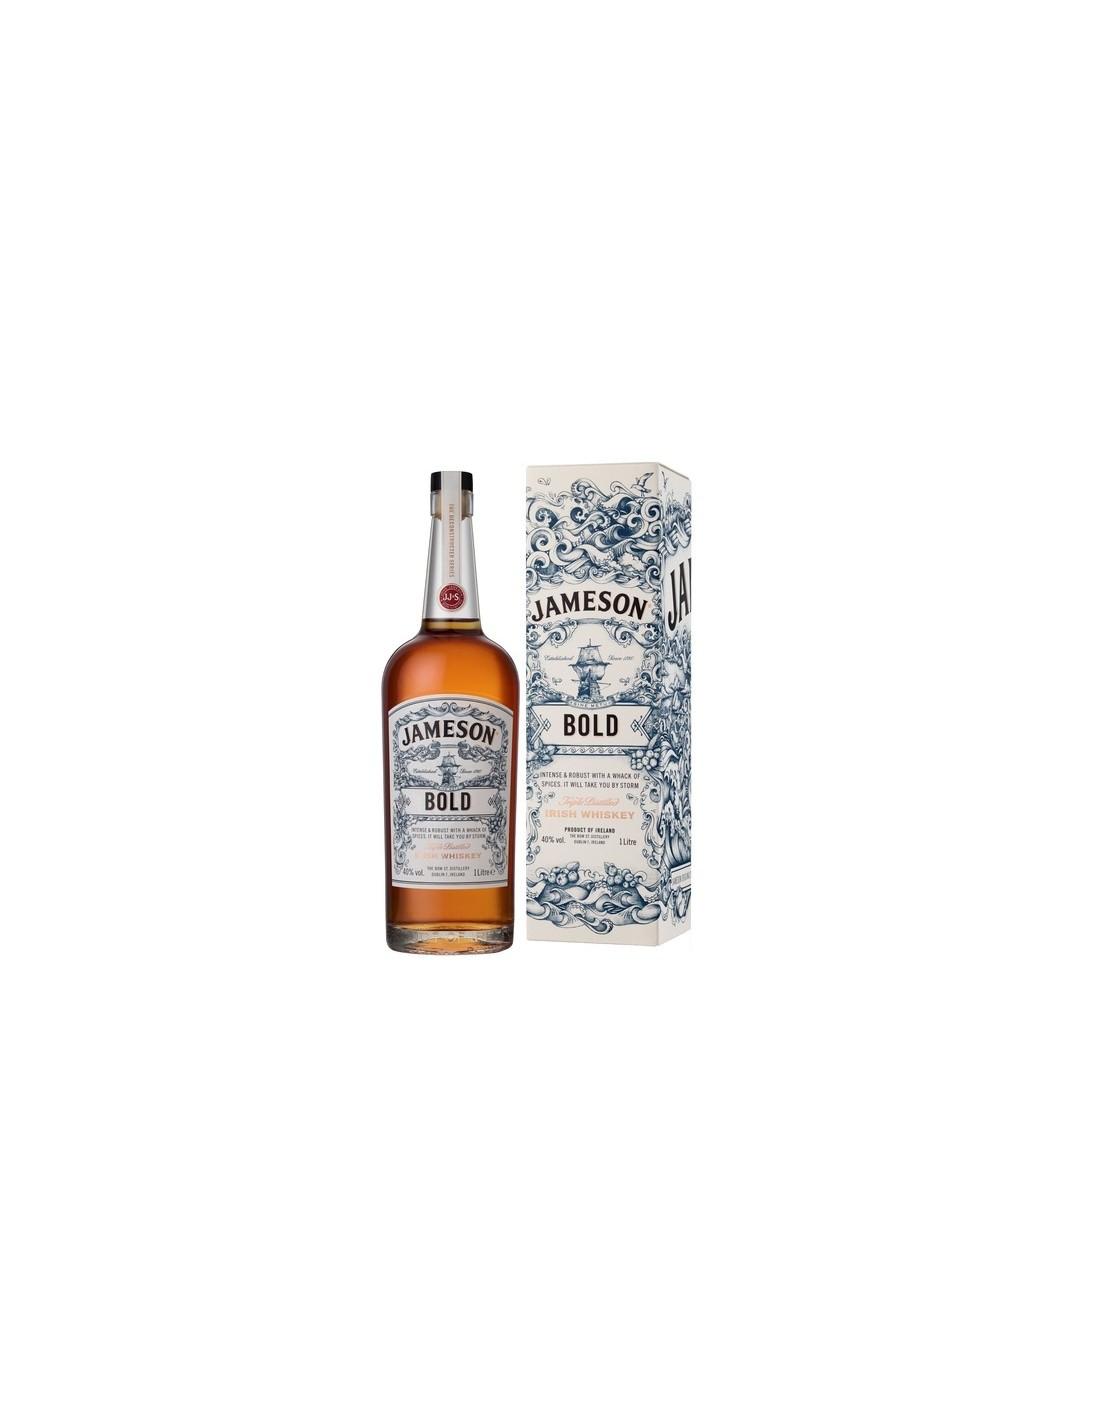 Whisky Jameson Deconstructed Bold, 40% alc., 1L, Irlanda